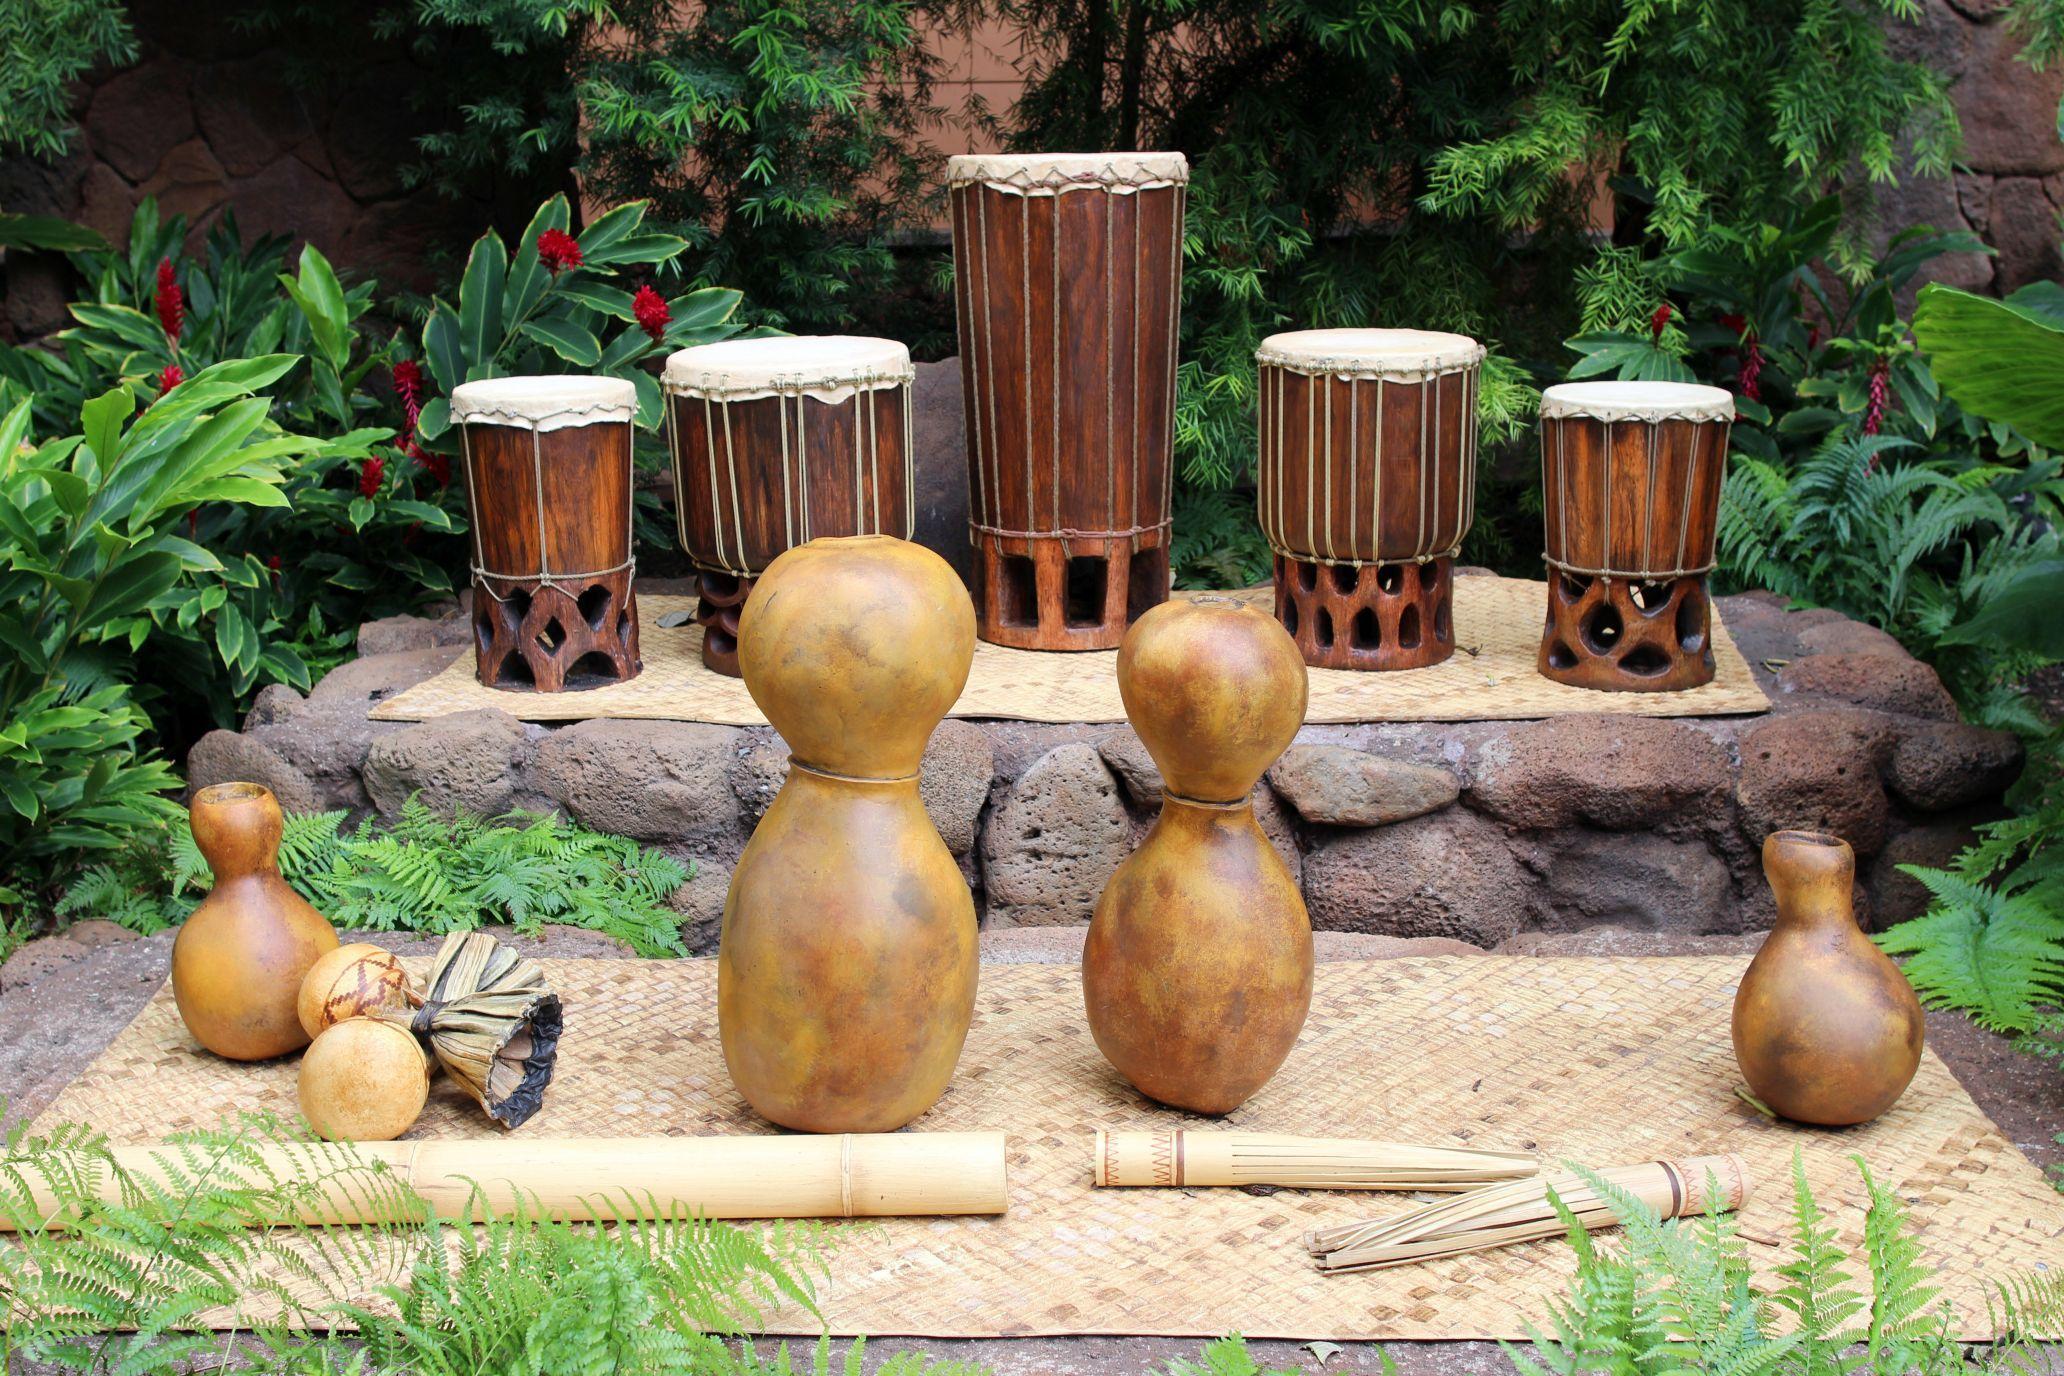 Lahaina Craft Fair Shop For Hawaii Souvenirs And Gifts Maui